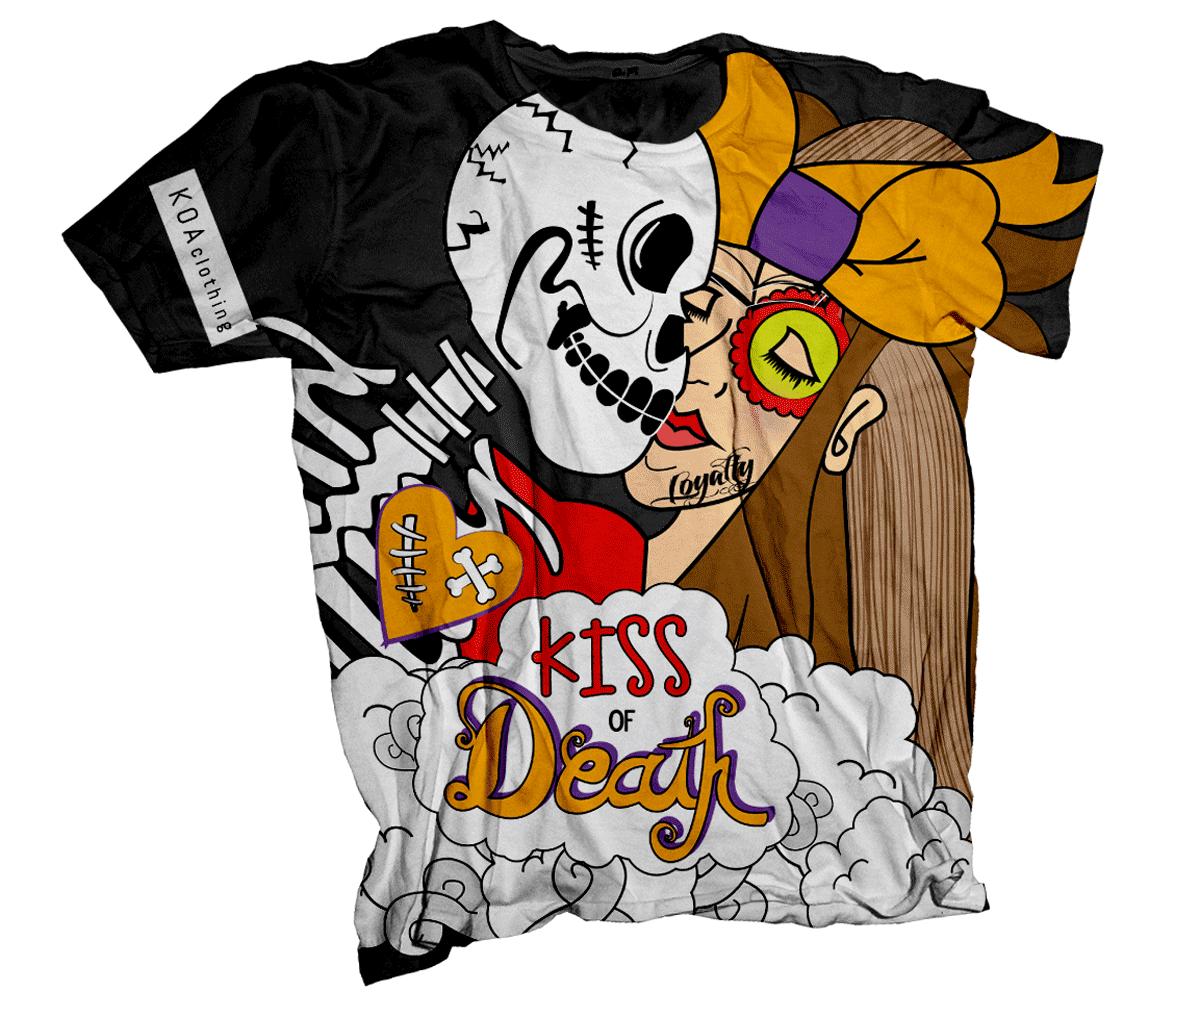 full-printed-tshirt.png